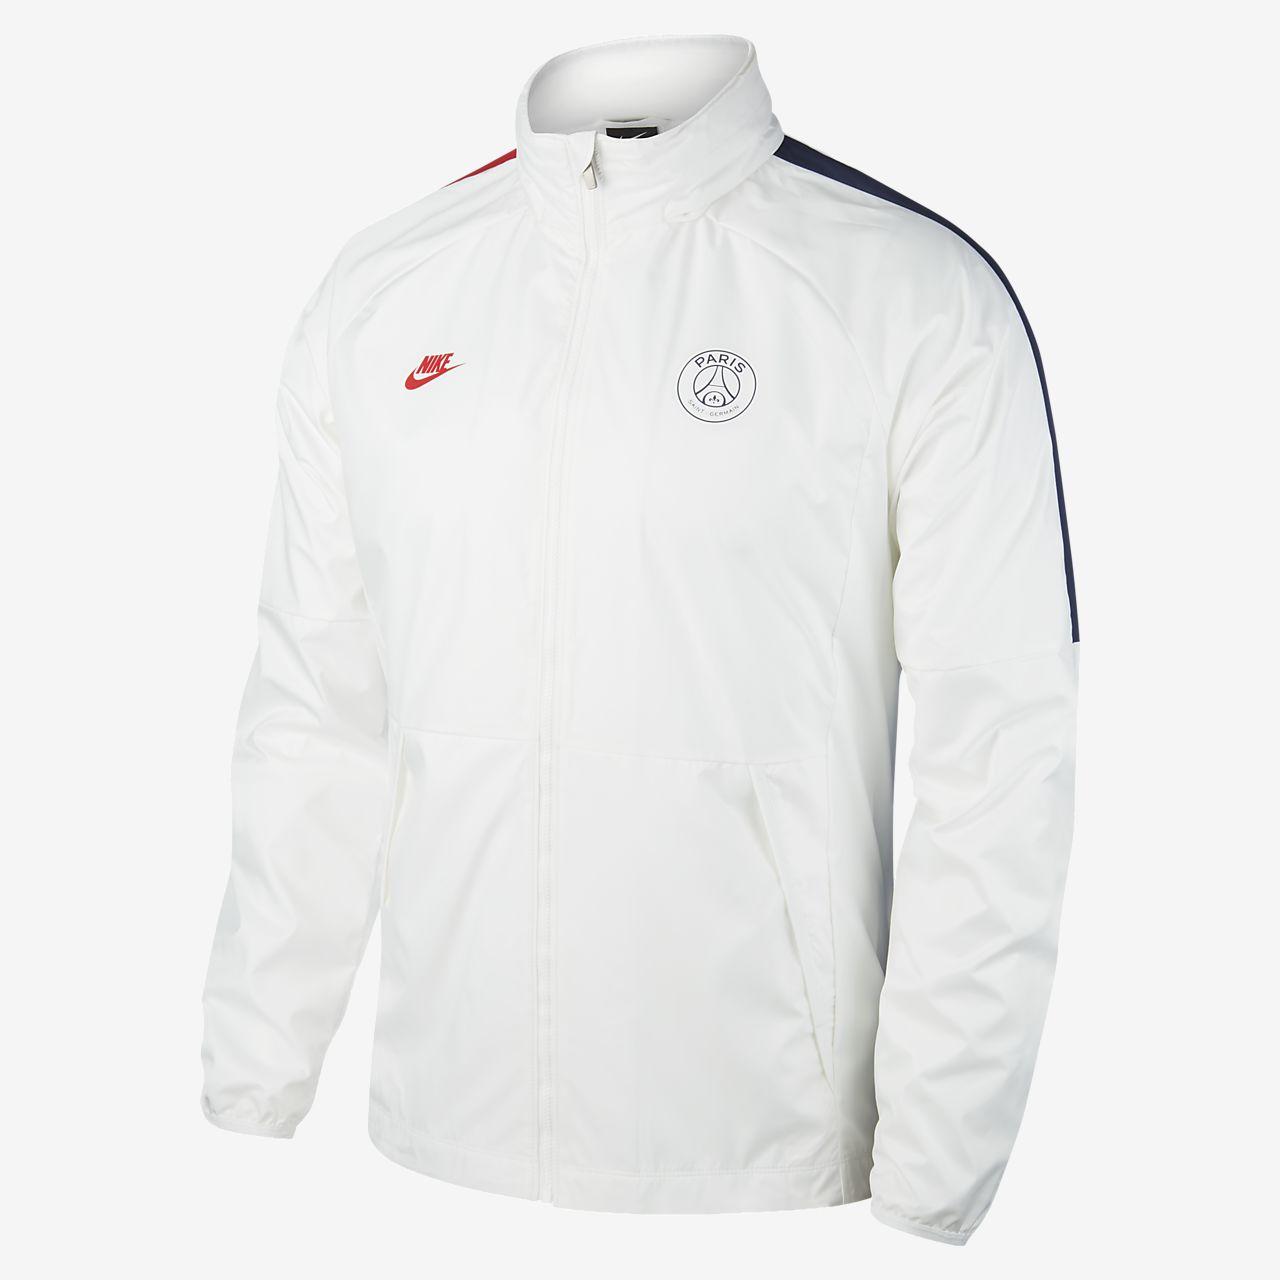 Paris Saint-Germain Men's Football Jacket